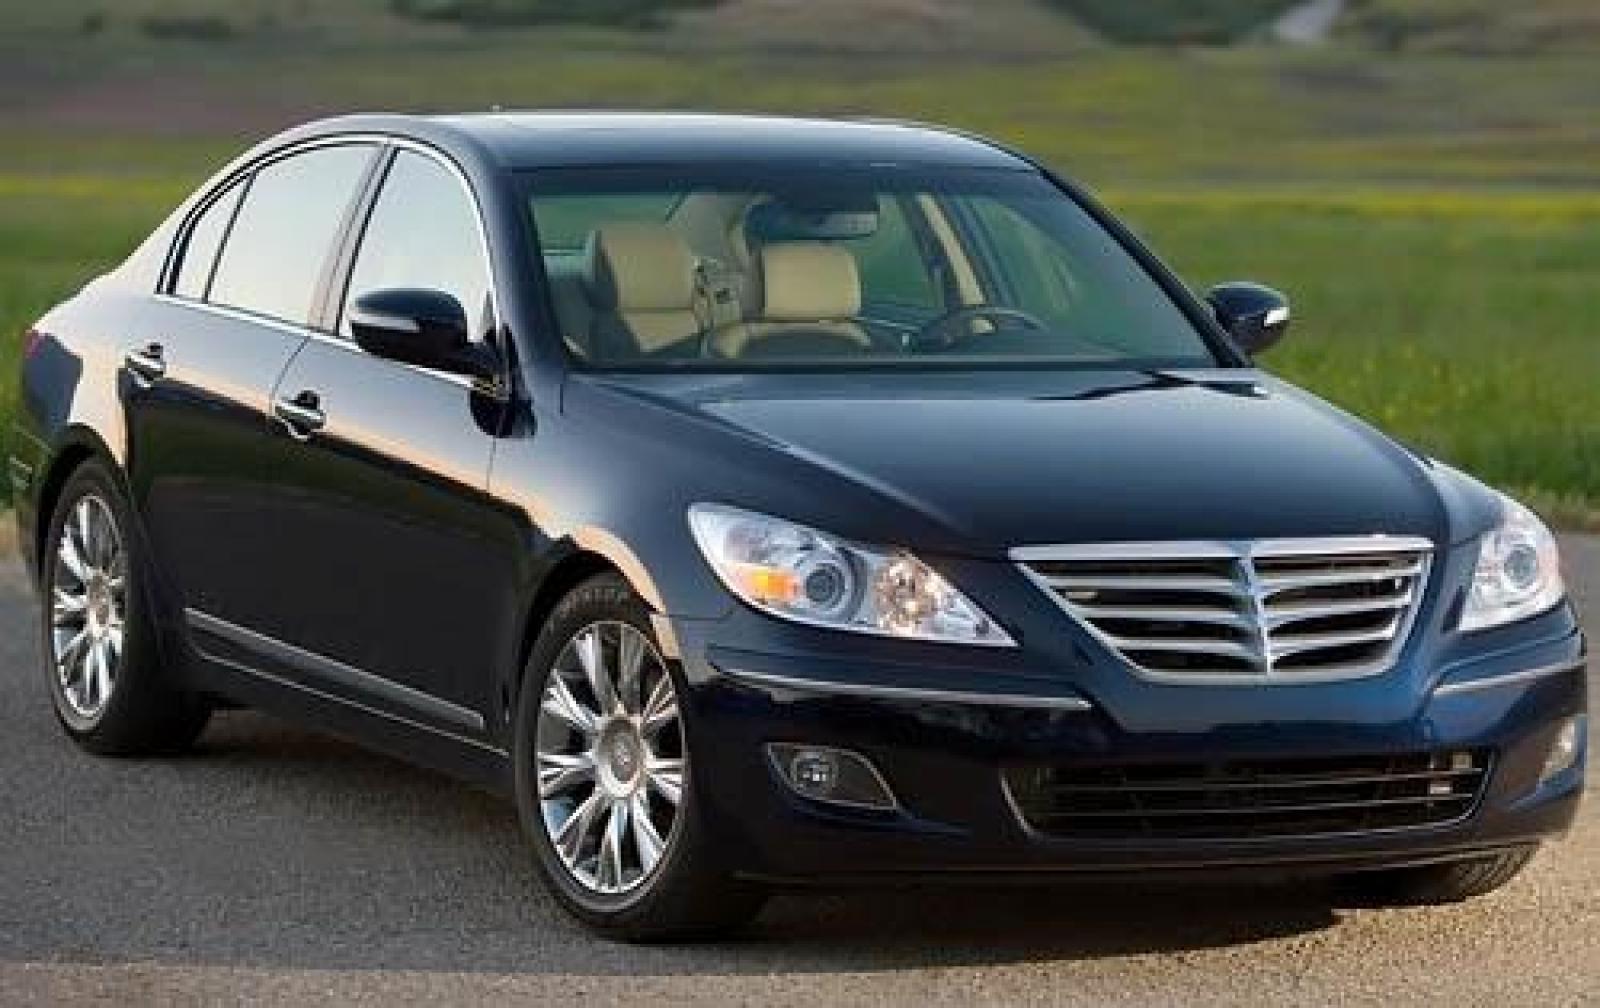 Hyundai Genesis I 2008 - 2011 Sedan :: OUTSTANDING CARS